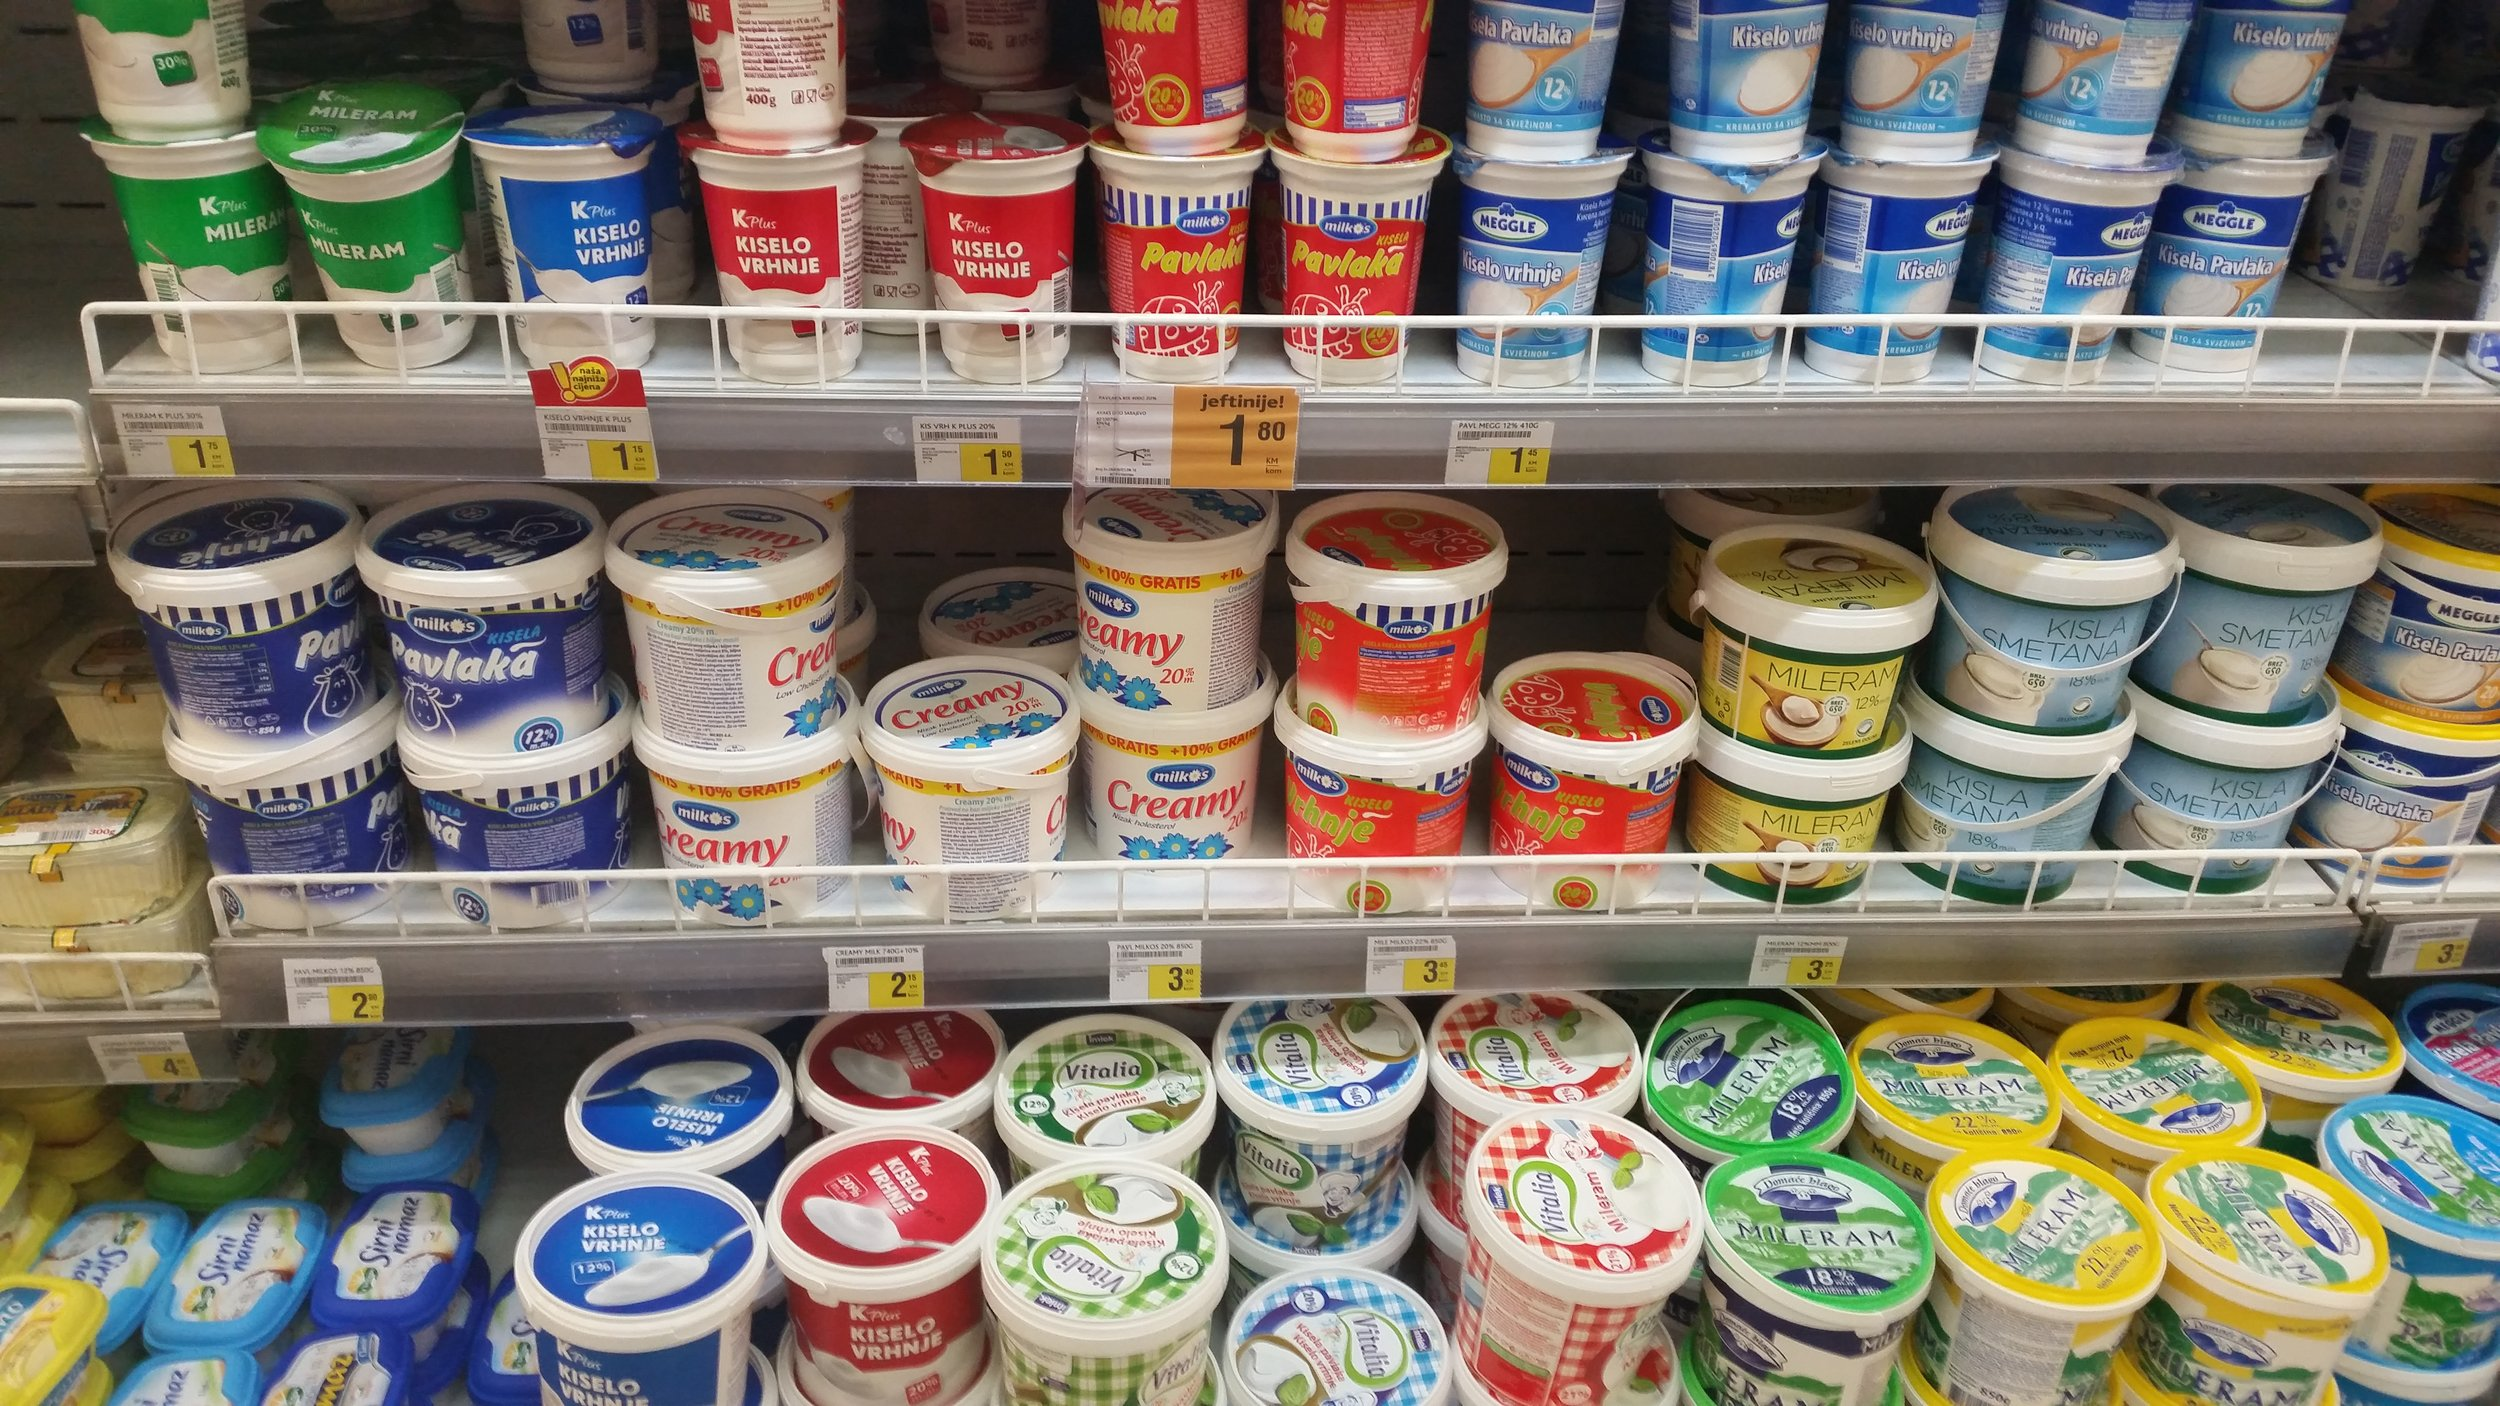 Rømme? Yoghurt? Smør? Kesam? Hvem vet.